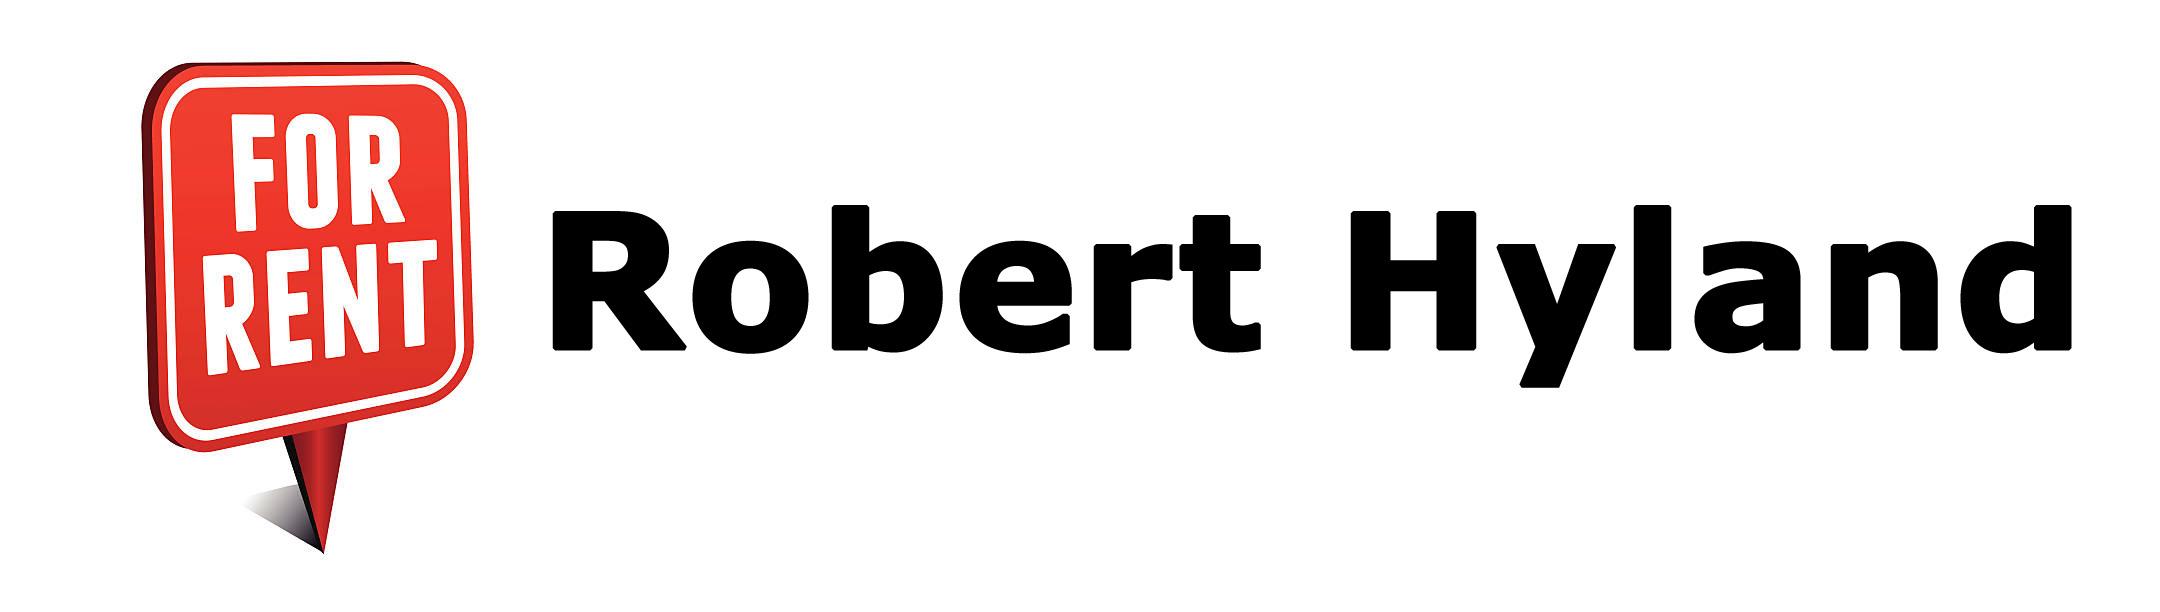 Robert Hyland